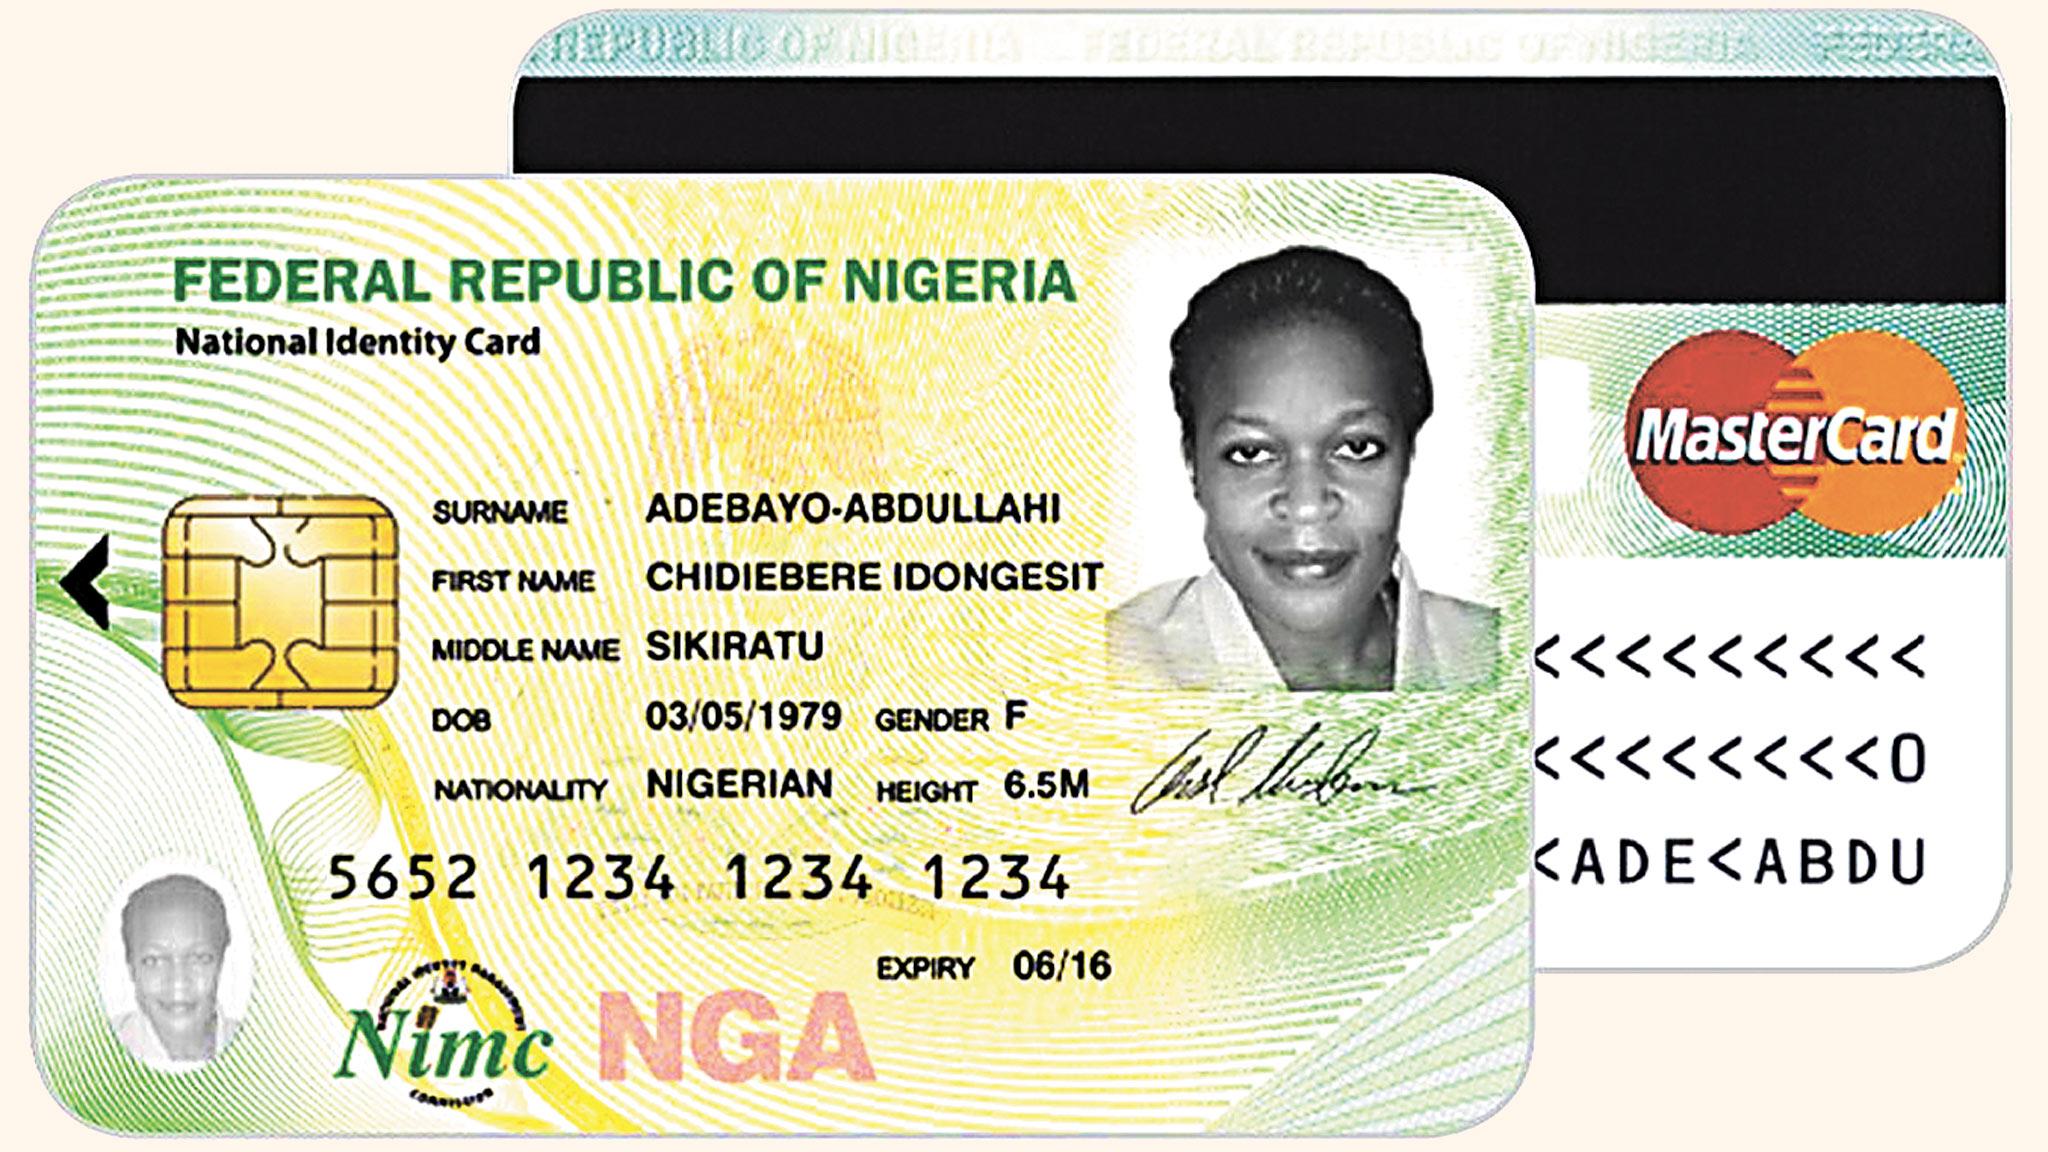 nigeria signs up mastercard to make dual